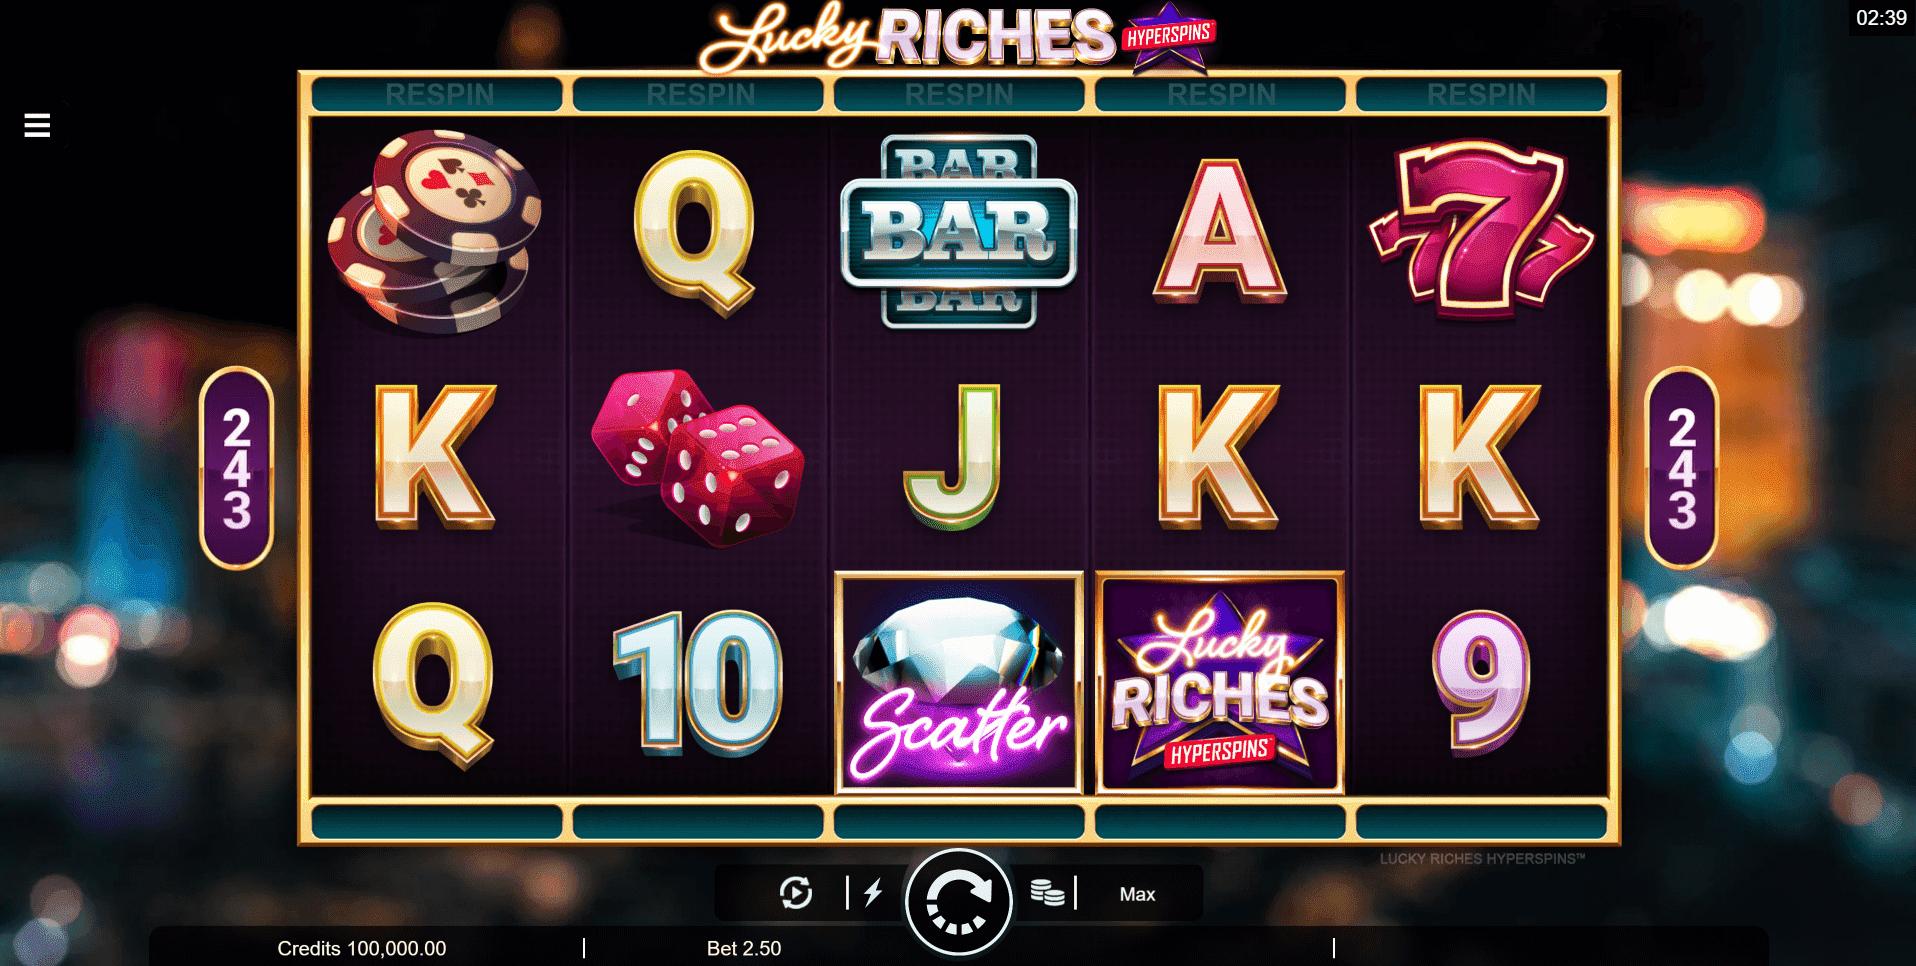 Lucky Riches Hyperspins slot machine screenshot